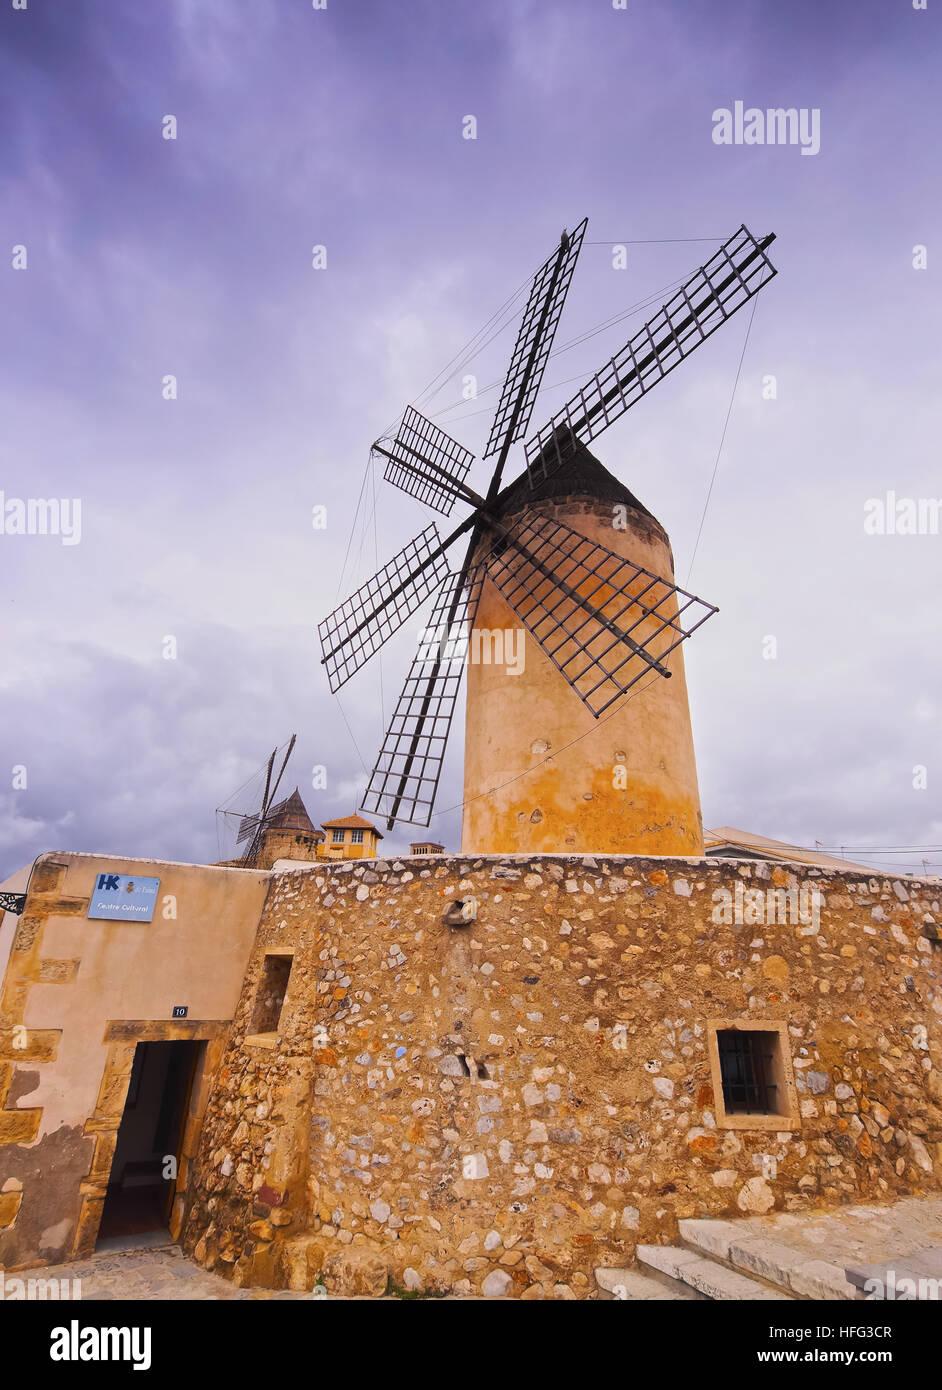 Windmühle, Palma De Mallorca, La Palma, Balearen, Spanien Stockbild